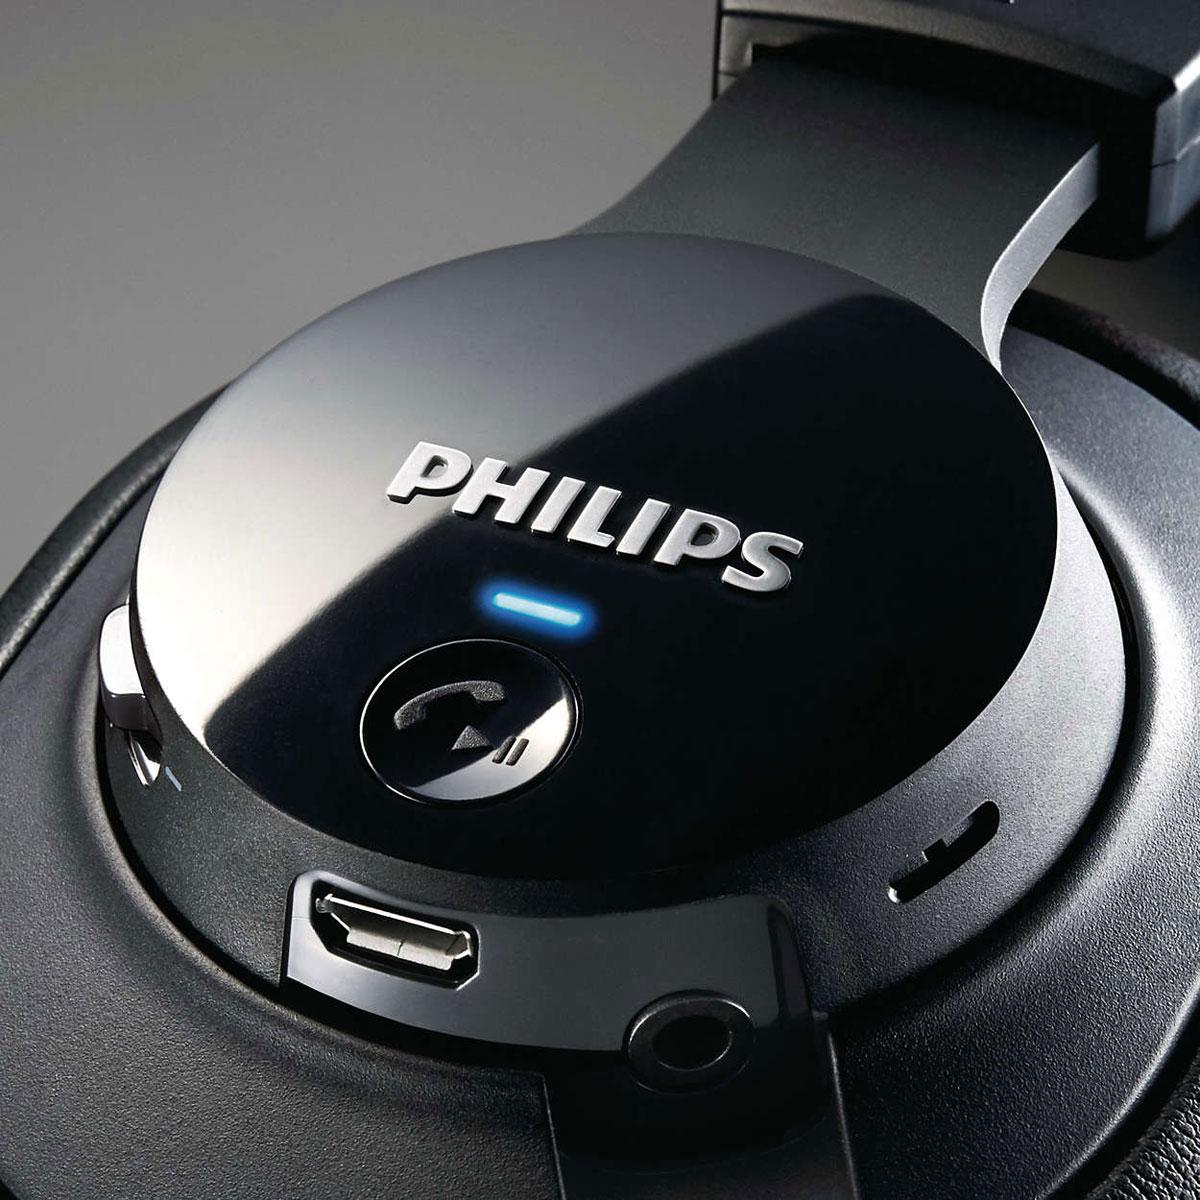 philips shb7150 casque philips sur. Black Bedroom Furniture Sets. Home Design Ideas